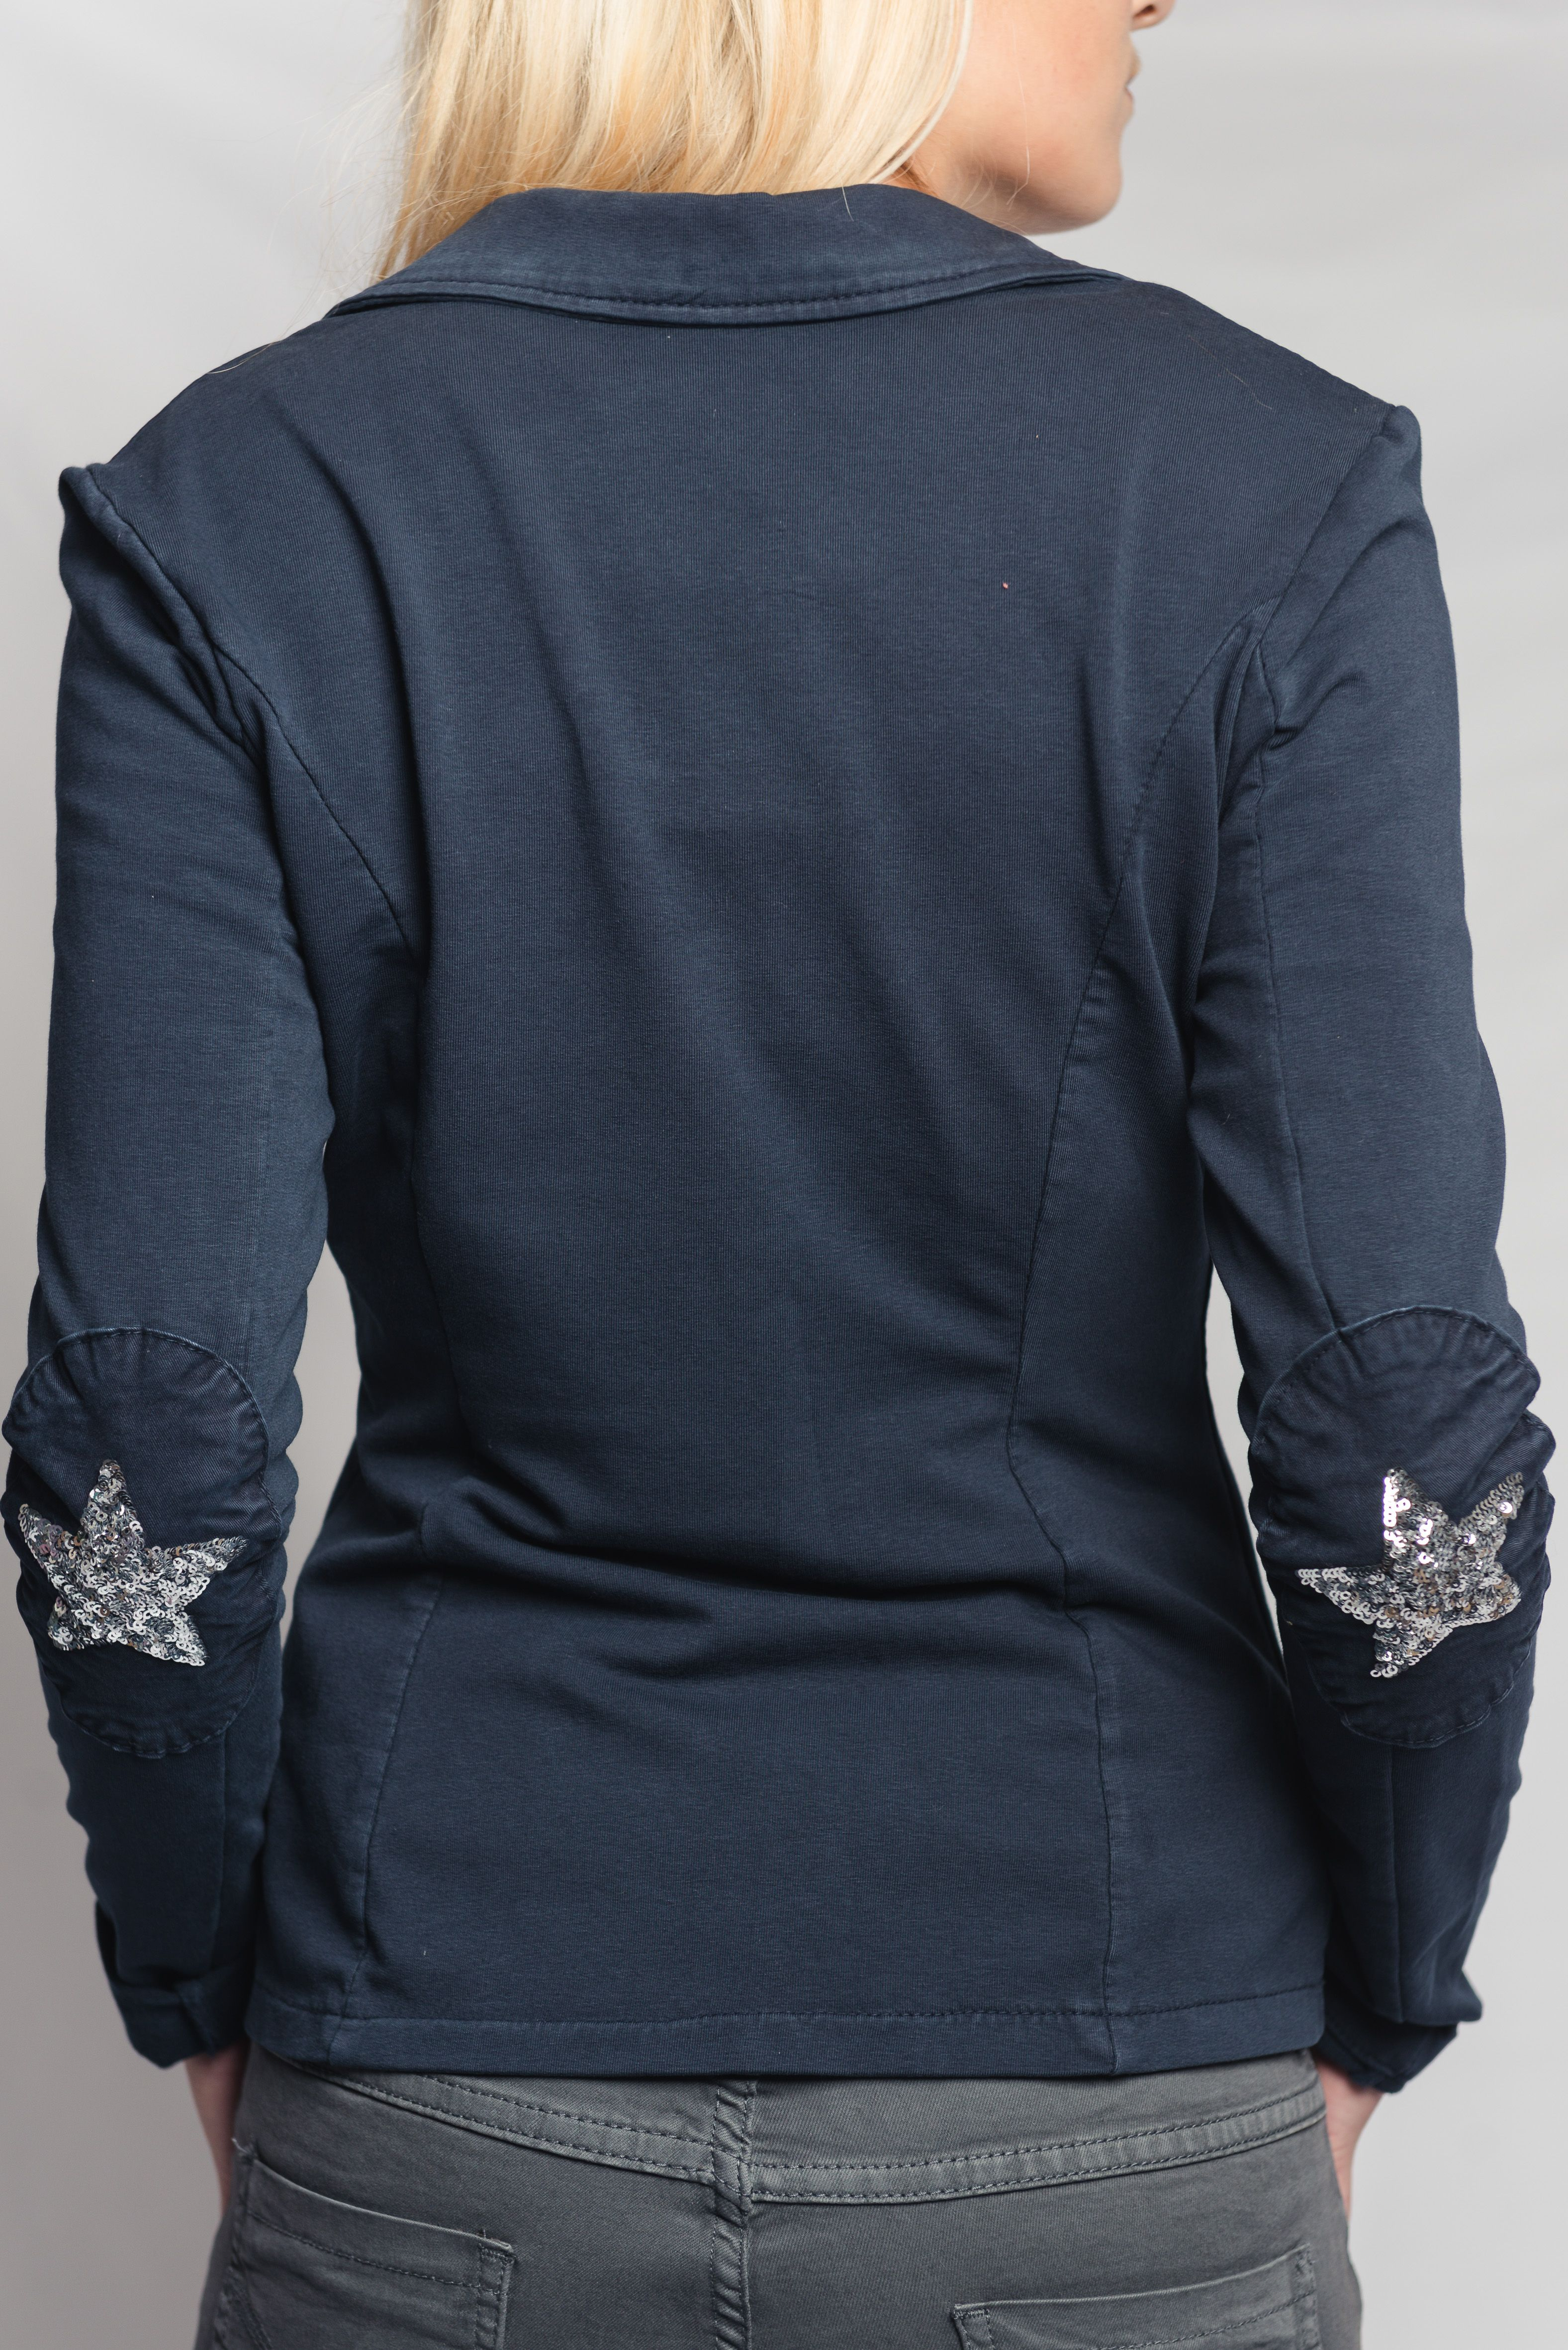 Petite veste bleue